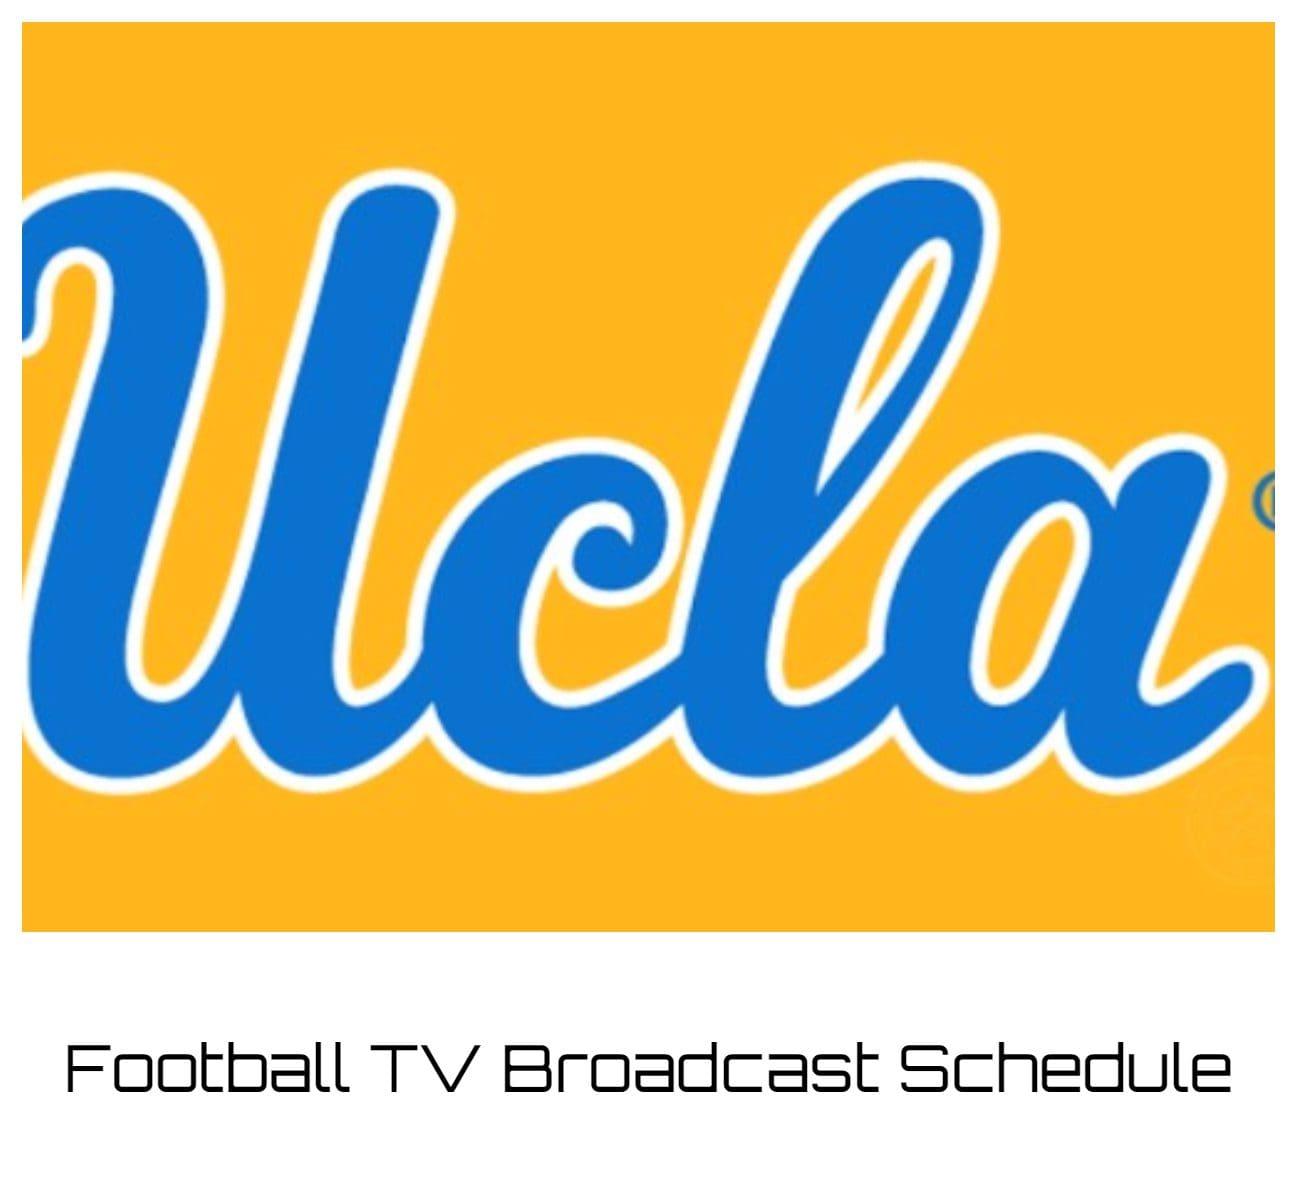 UCLA Bruins Football TV Broadcast Schedule